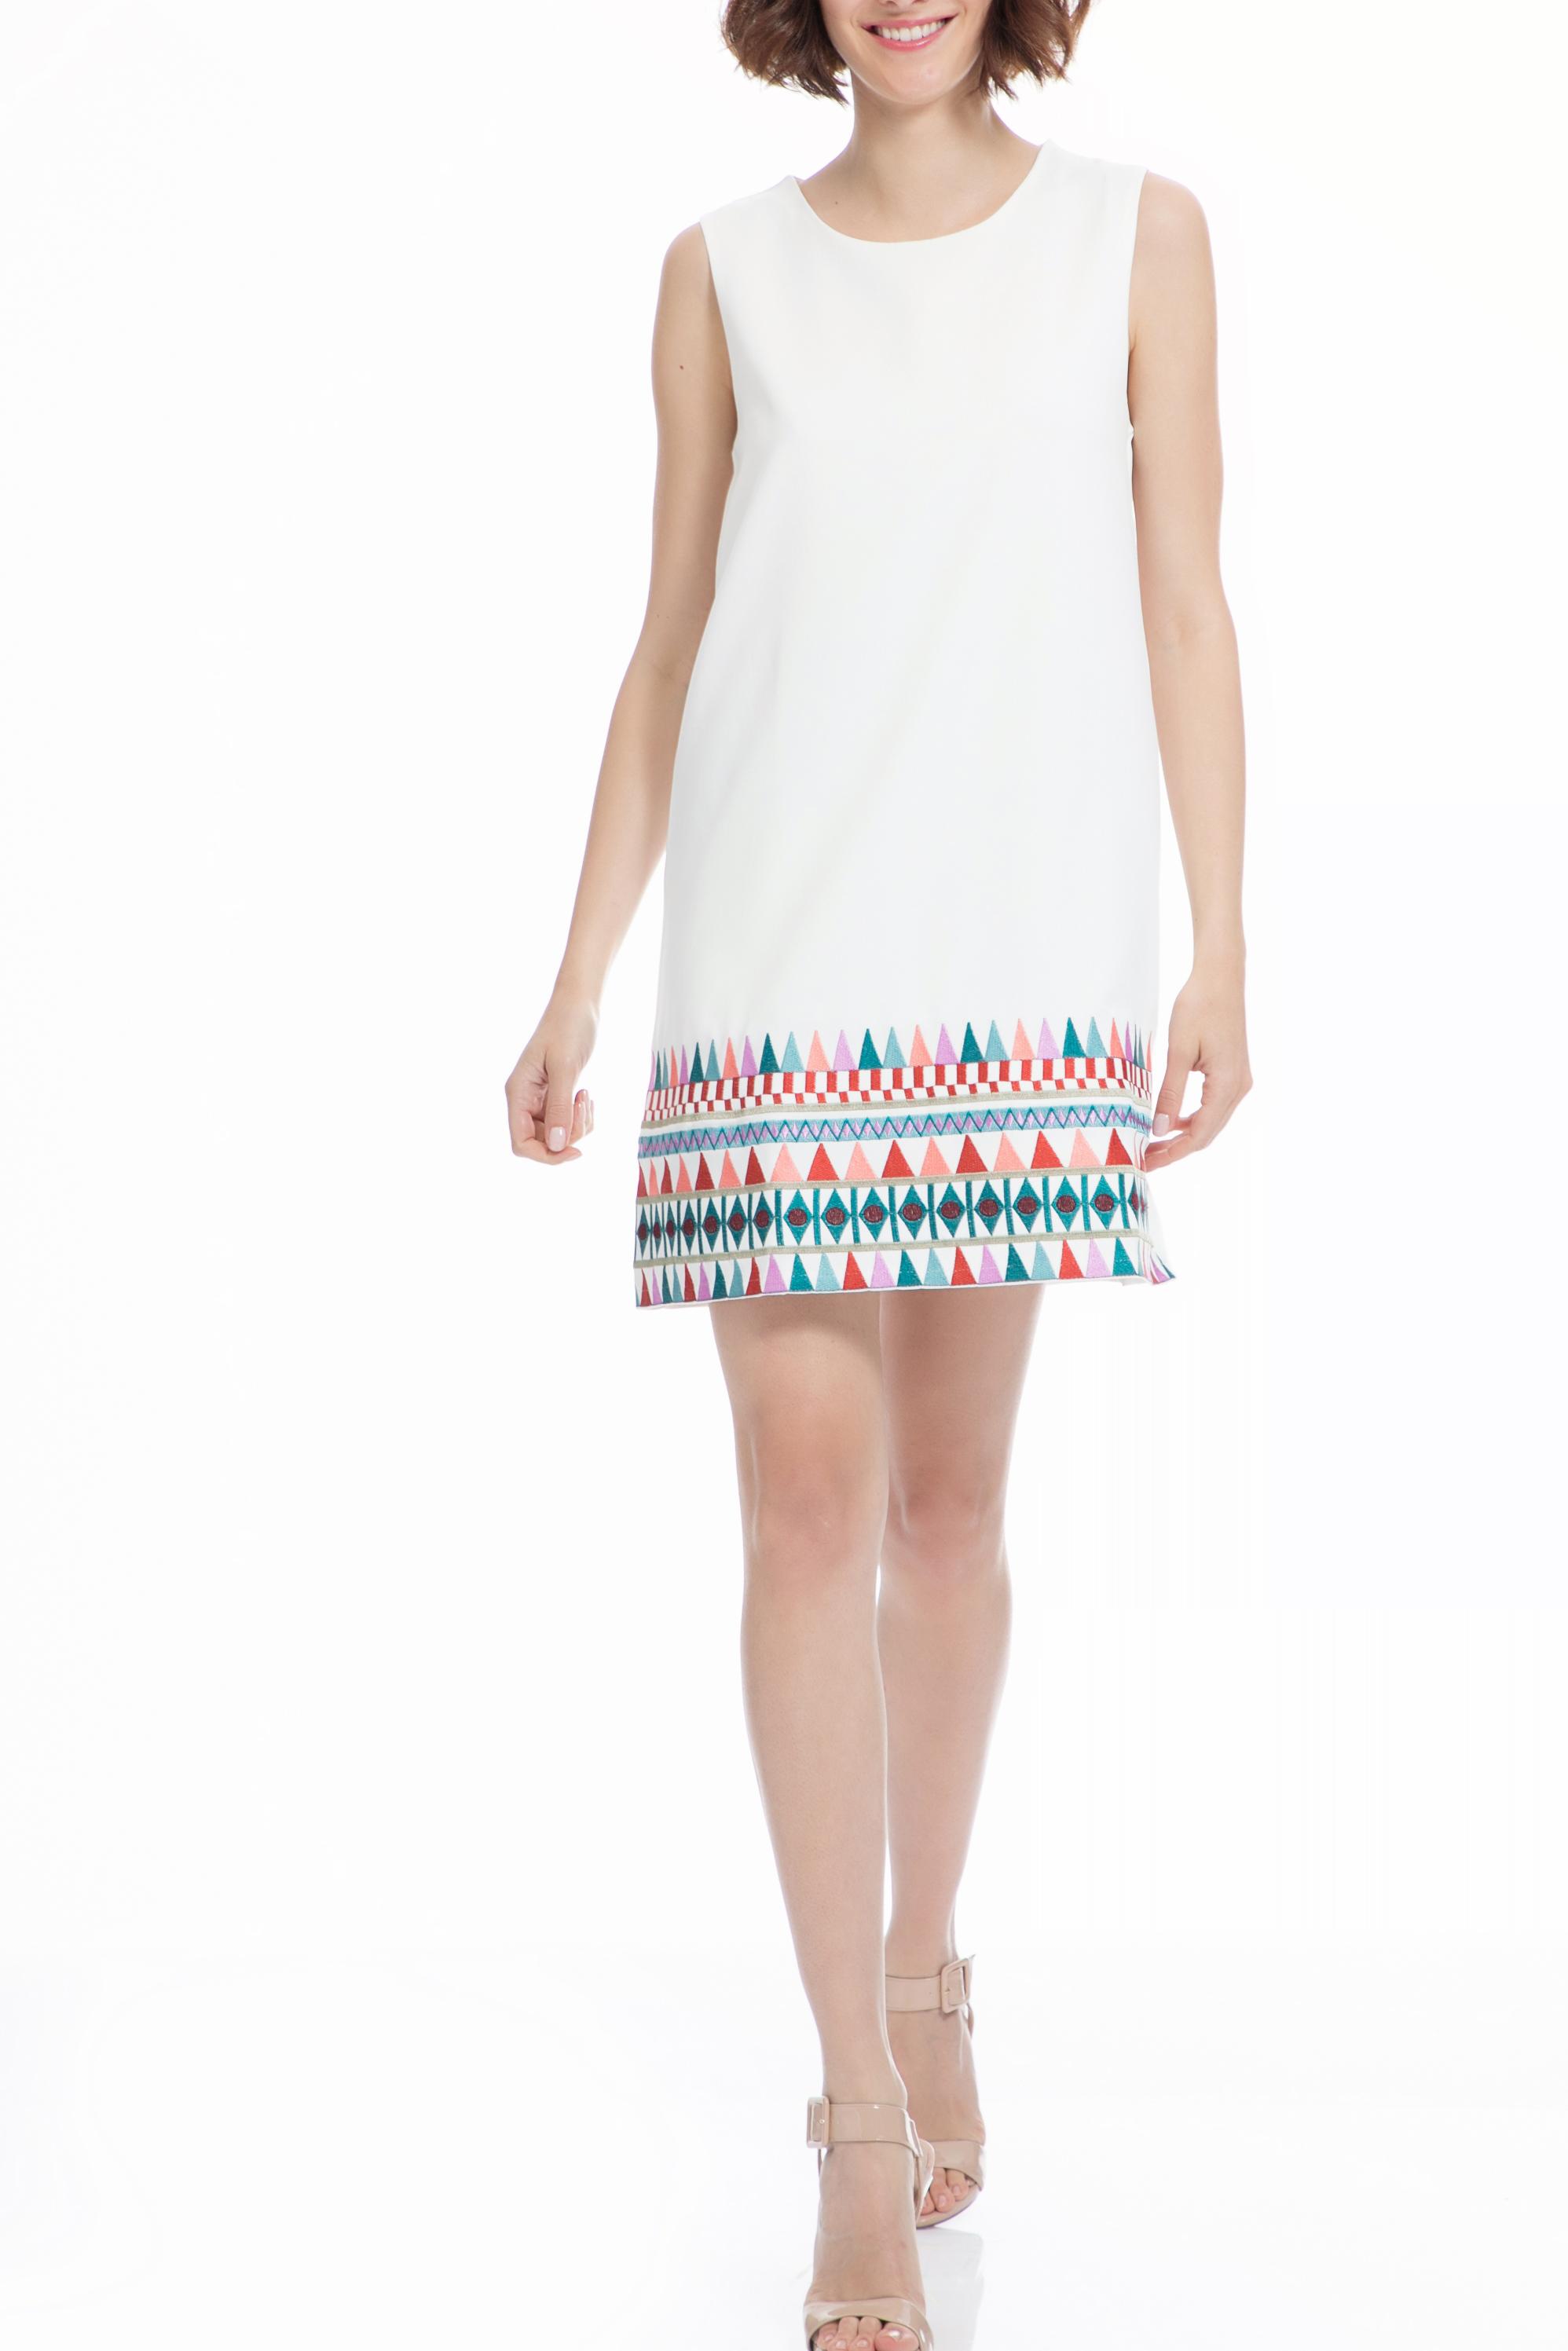 6d980b7ae48f MOLLY BRACKEN - Φόρεμα MOLLY BRACKEN λευκό